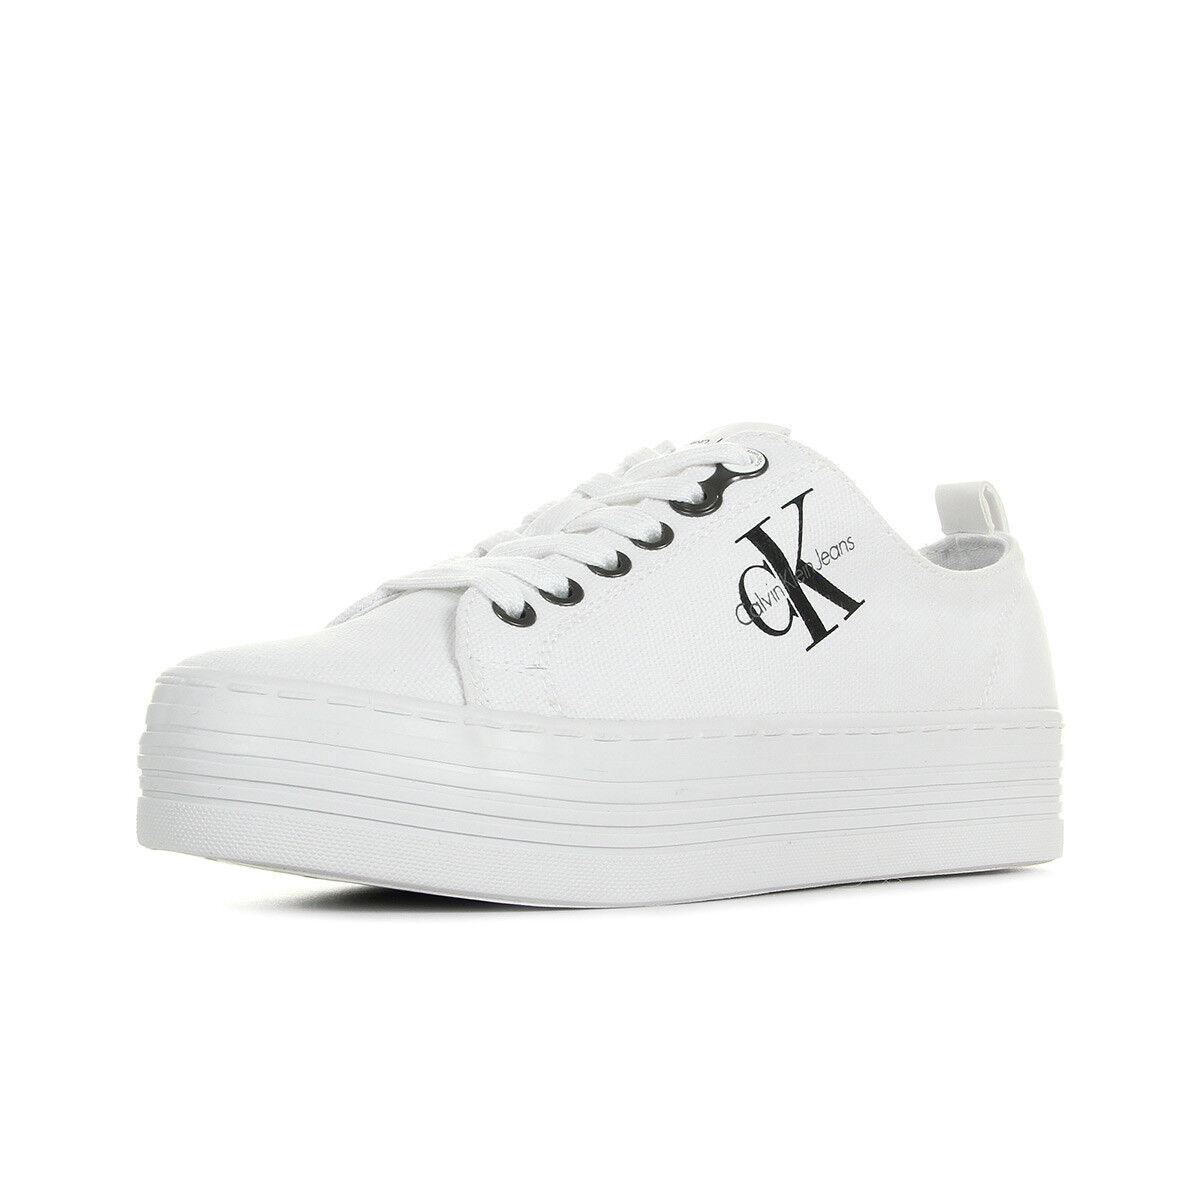 Schuhe Calvin Klein Damen Zolah Canvas Blanc weiß